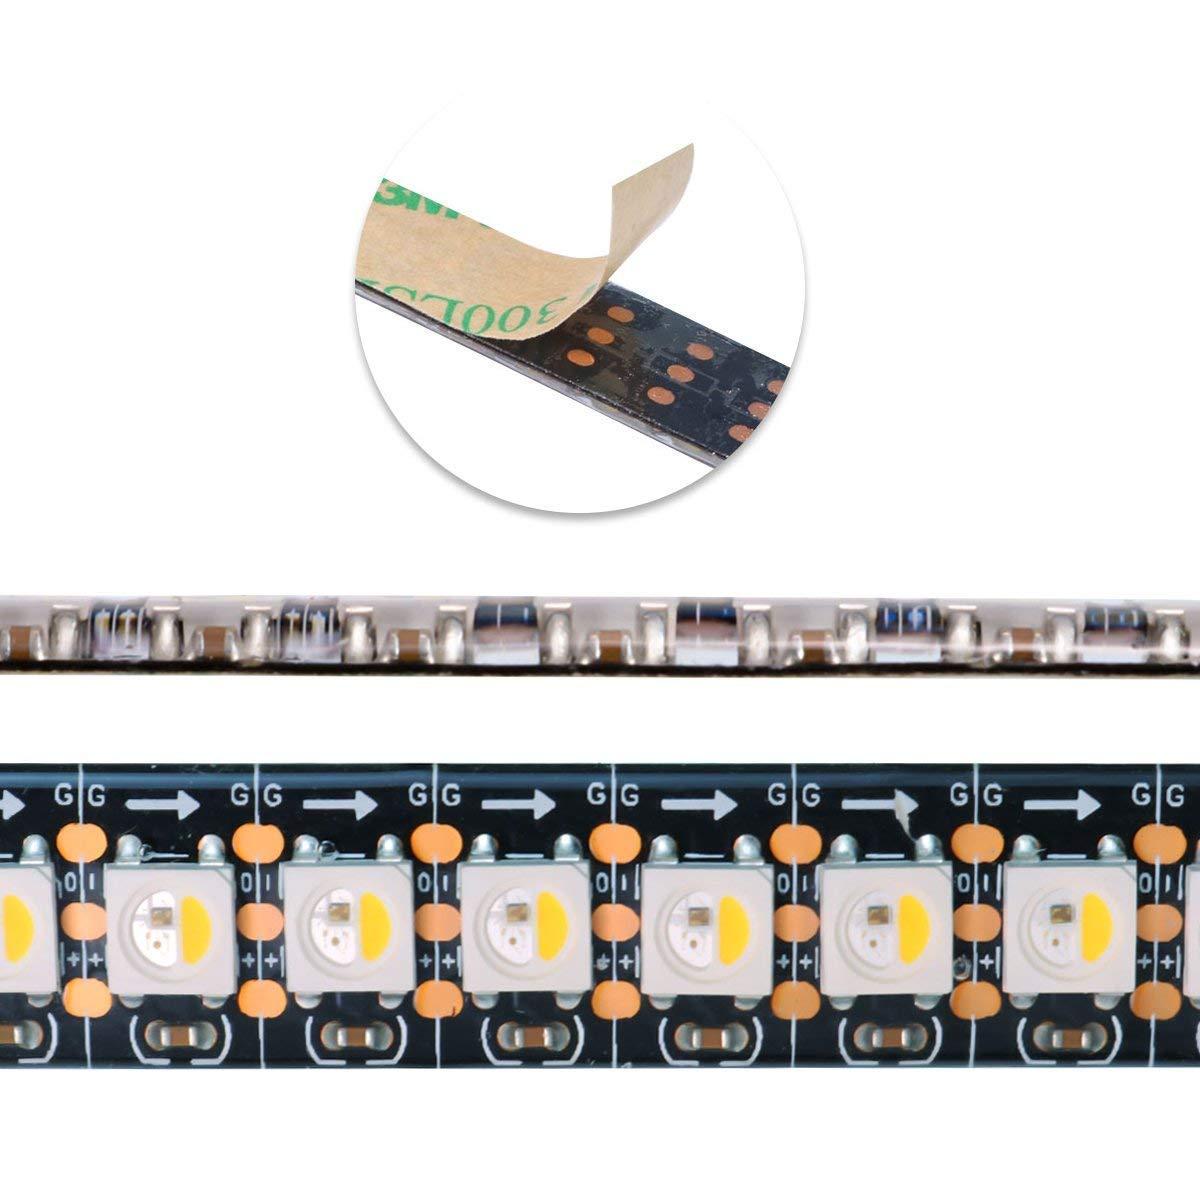 MOKUNGIT RGBW RGBWW RGB+Warm White SK6812 (Similar WS2812B) 3.3ft/1m 144leds/m Individually Addressable Flexible 4 color in 1 LED Dream Color LED Strip Black PCB Waterproof IP65 DC5V